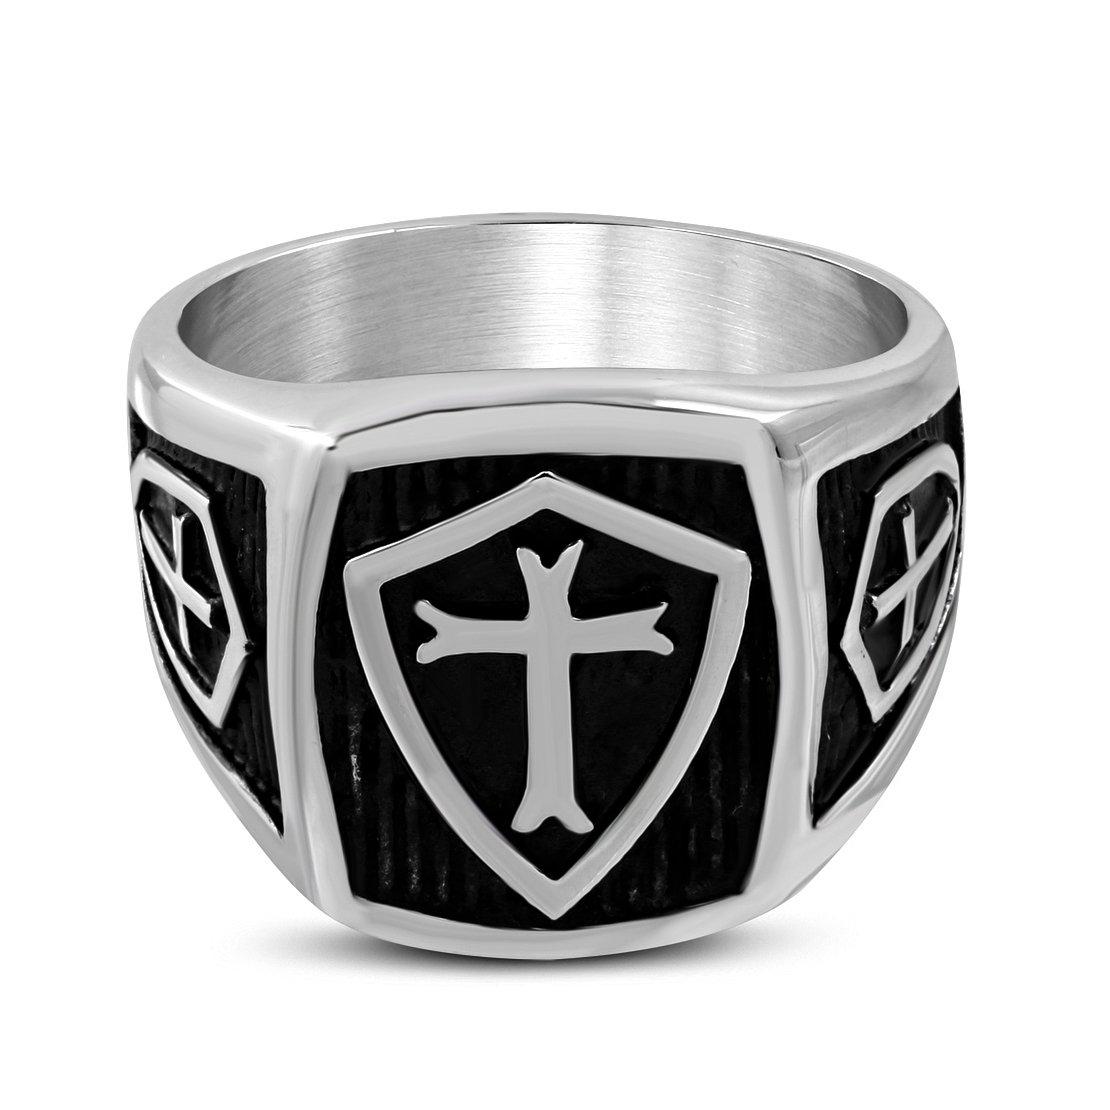 Stainless Steel 2 Color Latin Cross Shield Biker Ring